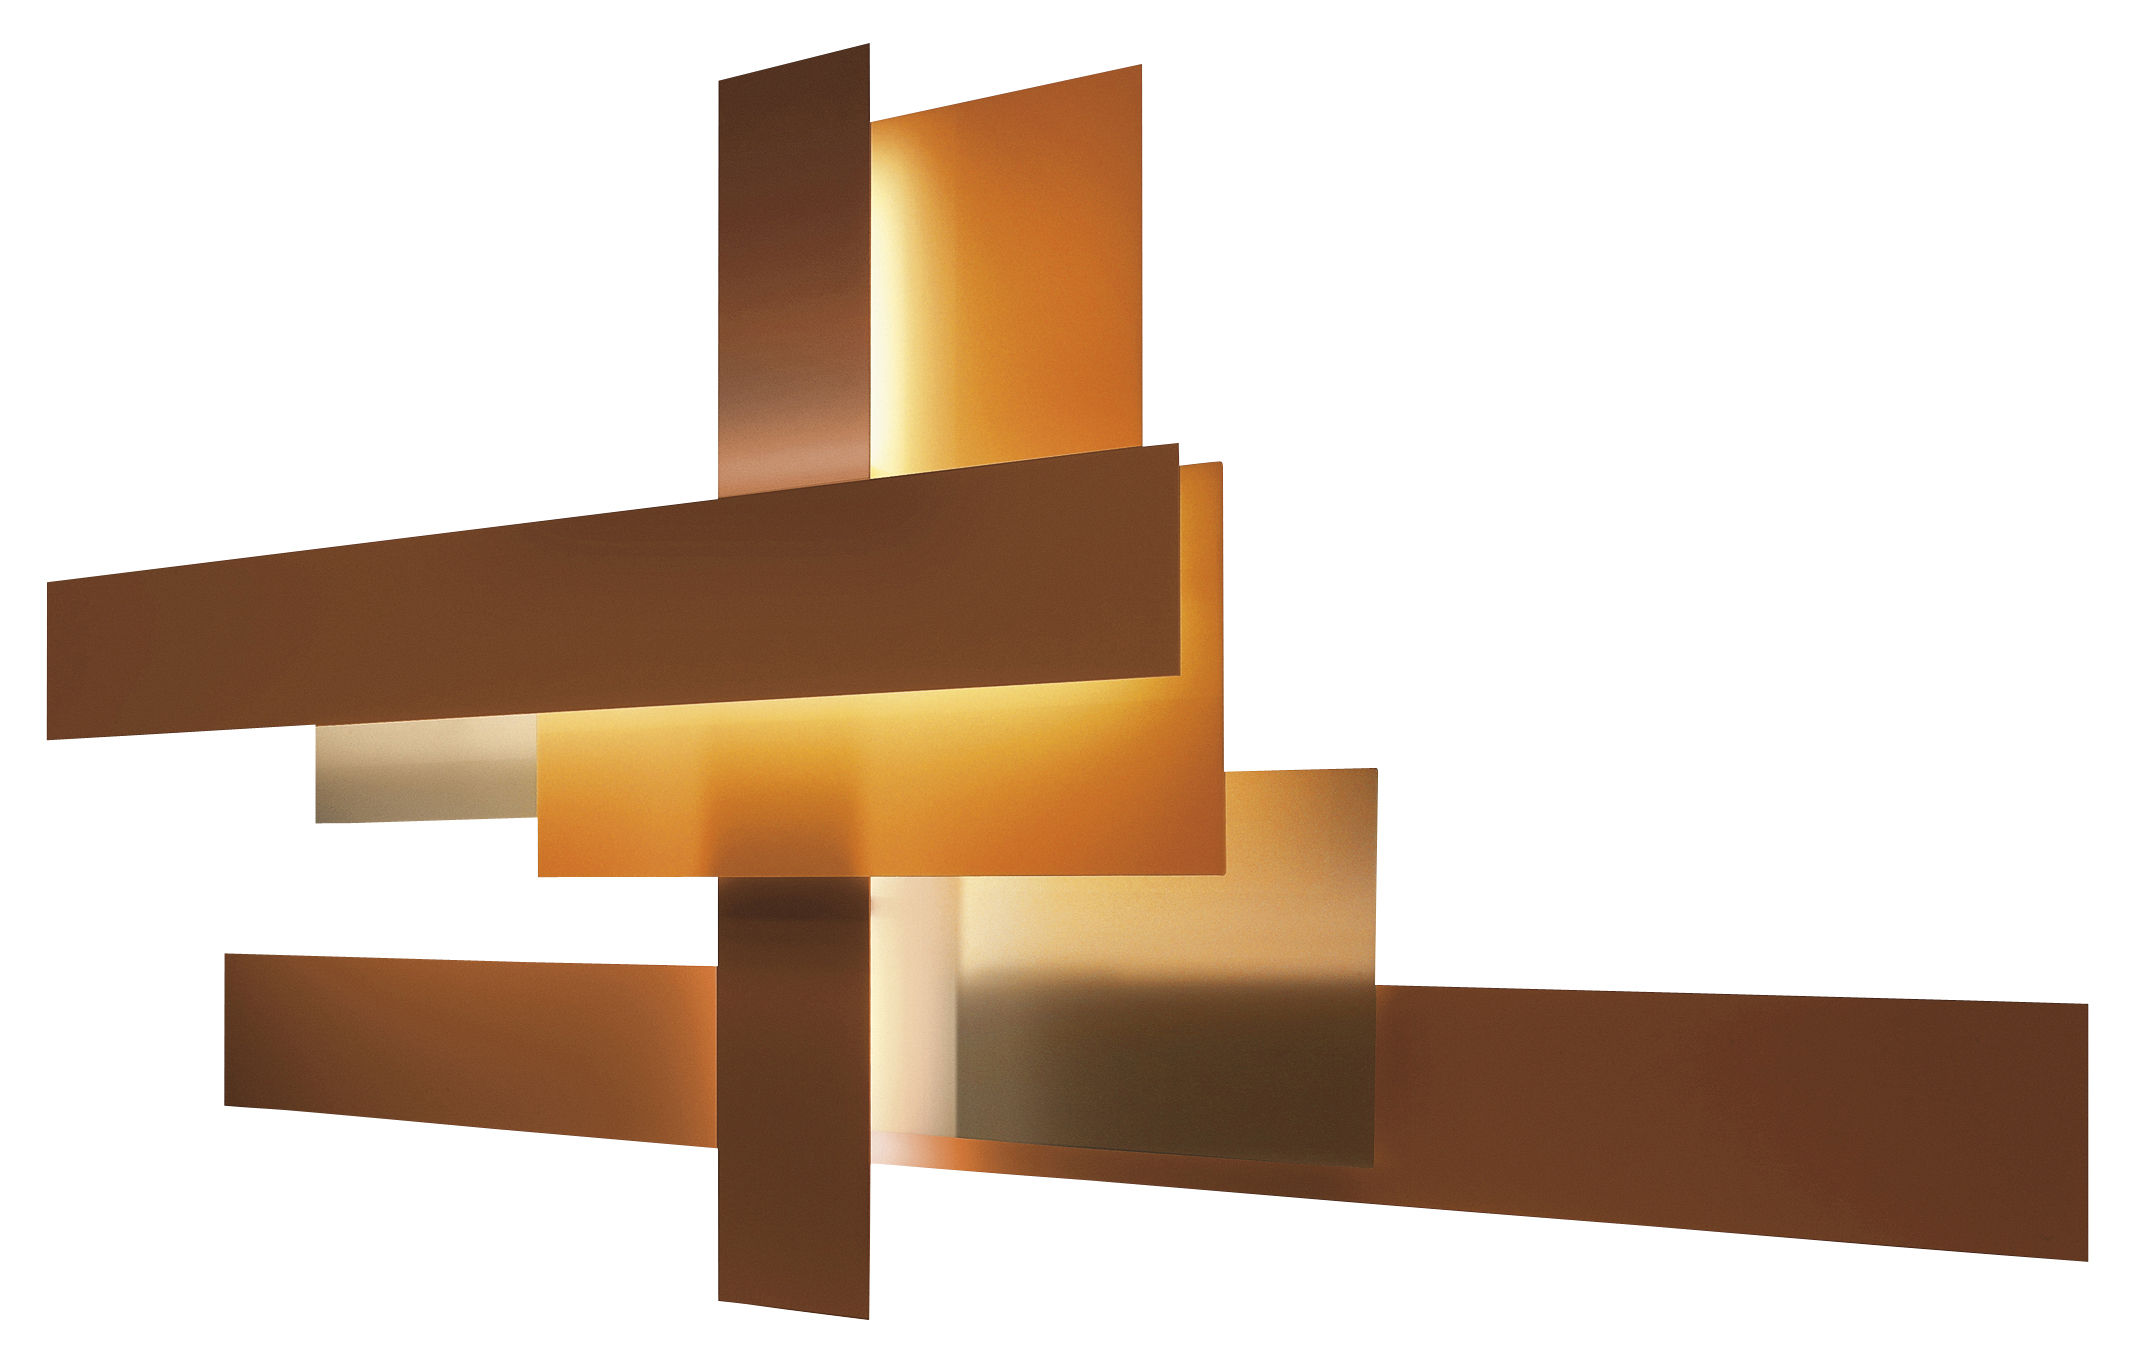 Leuchten - Wandleuchten - Fields Wandleuchte 3 Stück - Foscarini - Orange / Rot - Methacrylate